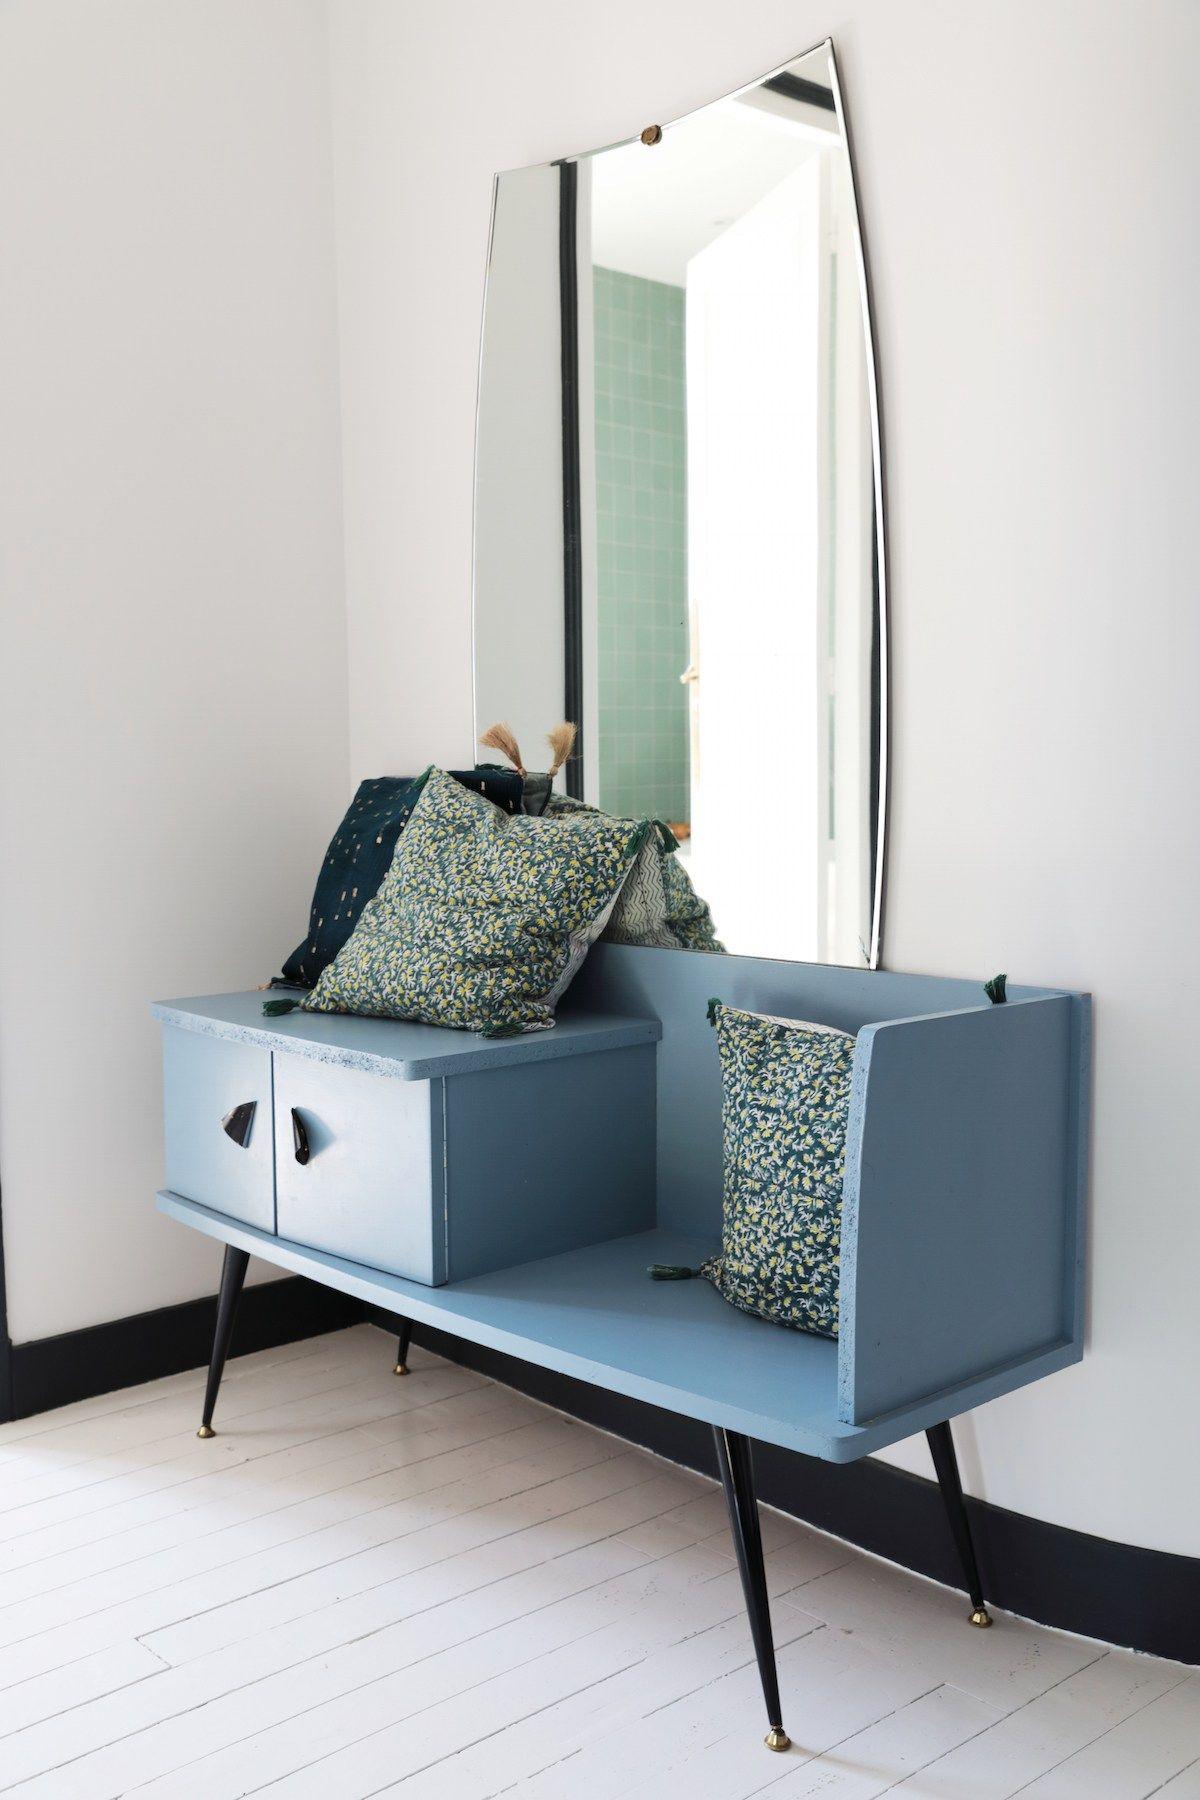 La Maison Art Deco De Mylene Co Directrice De Frangin Frangine En 2020 Maison Art Deco Deco Art Deco